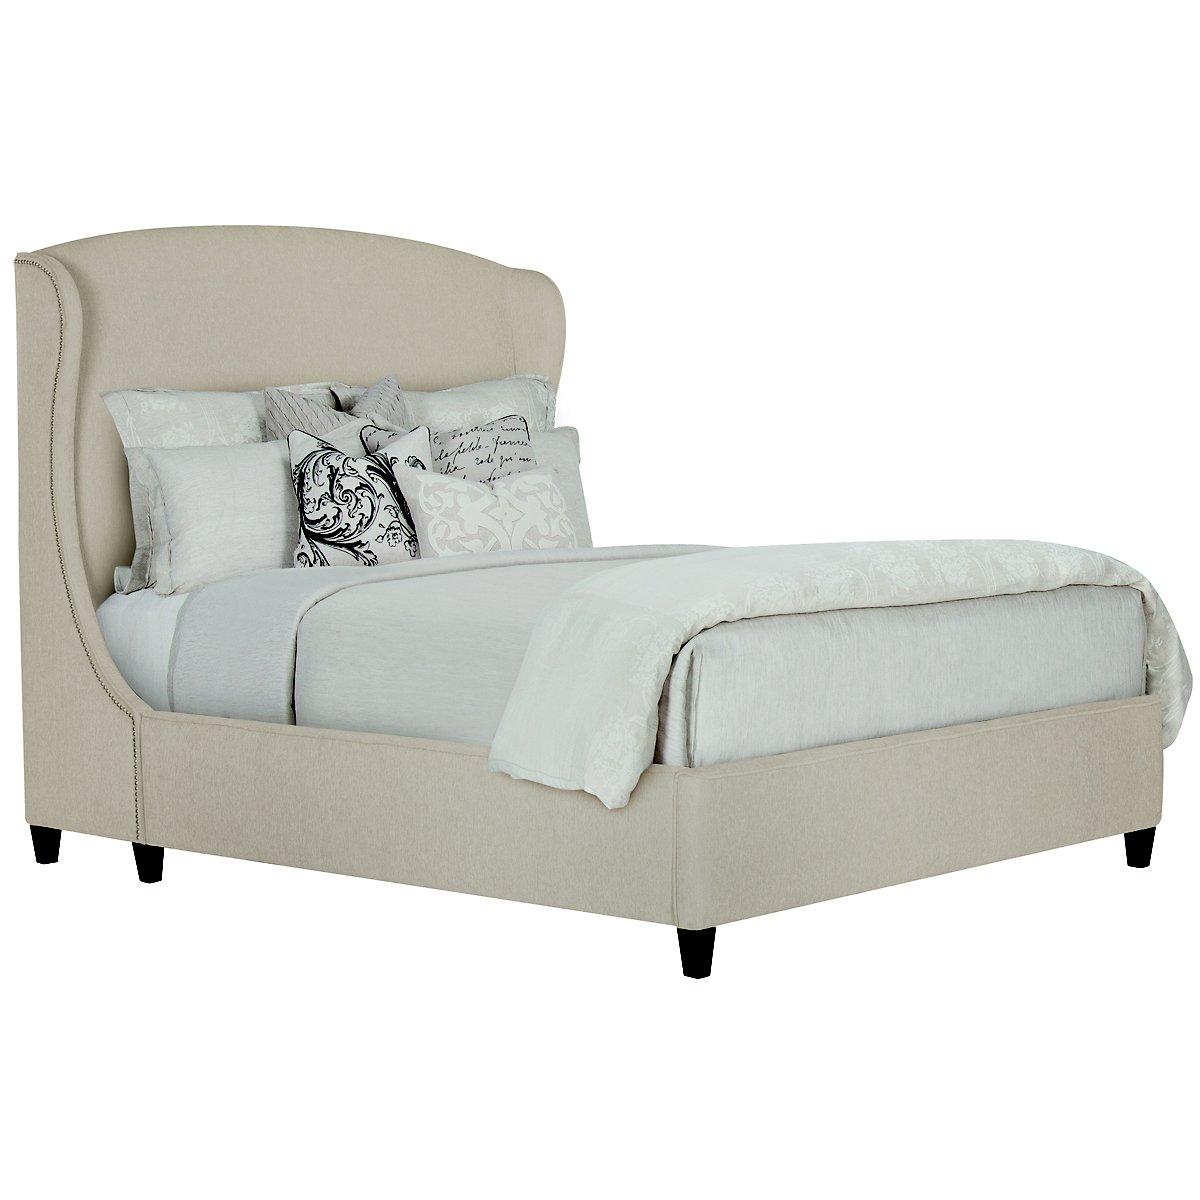 Canyon Light Taupe Upholstered Platform Bed